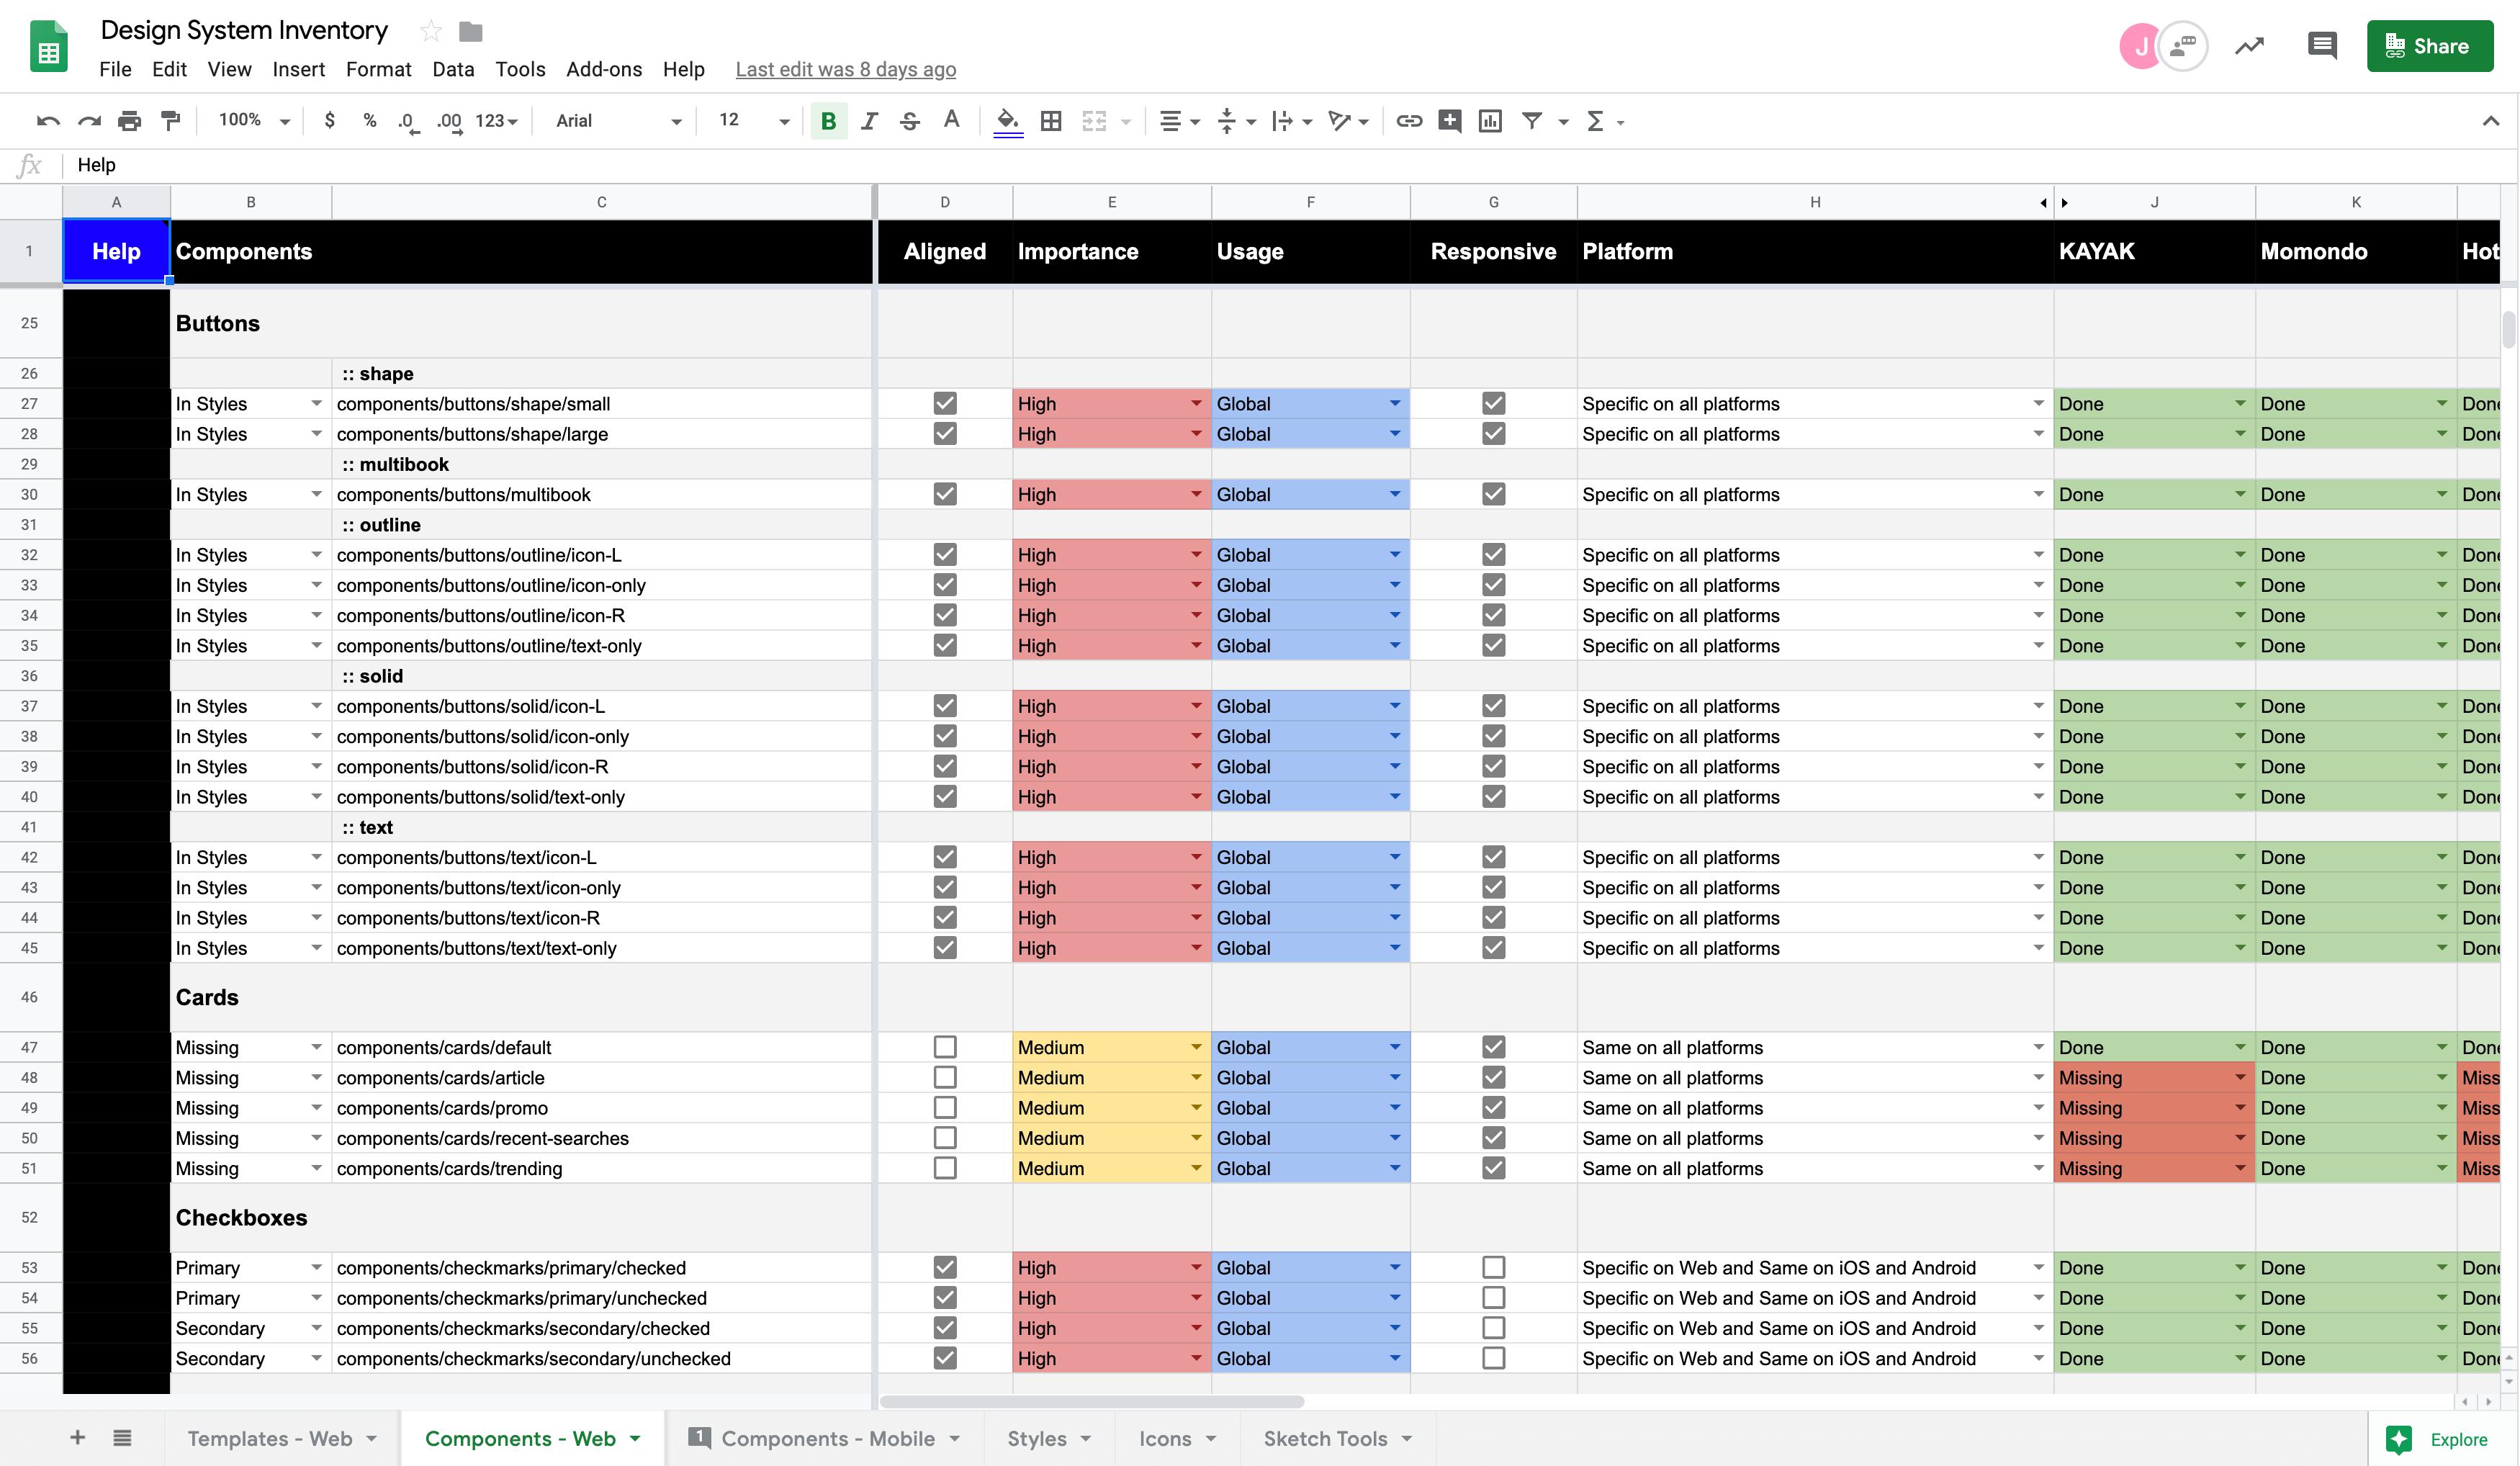 design-system-inventory